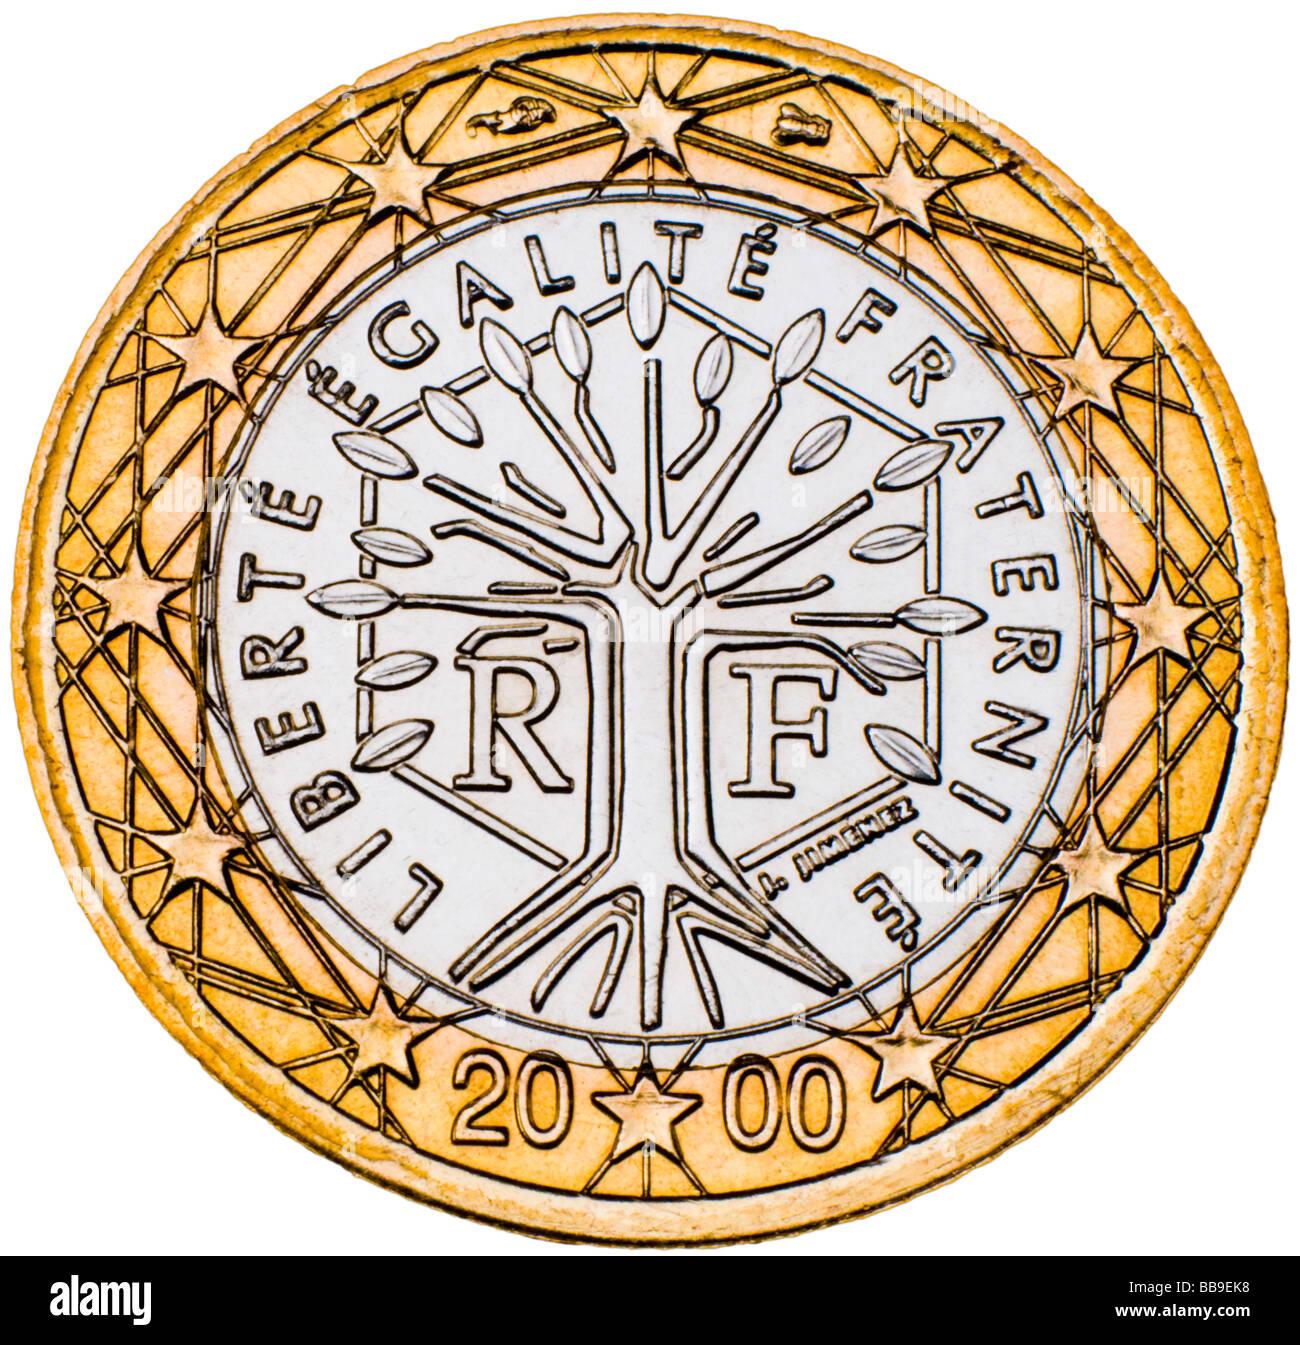 Französisch 1 Euro Münze Rückseite Stockfoto Bild 24180668 Alamy